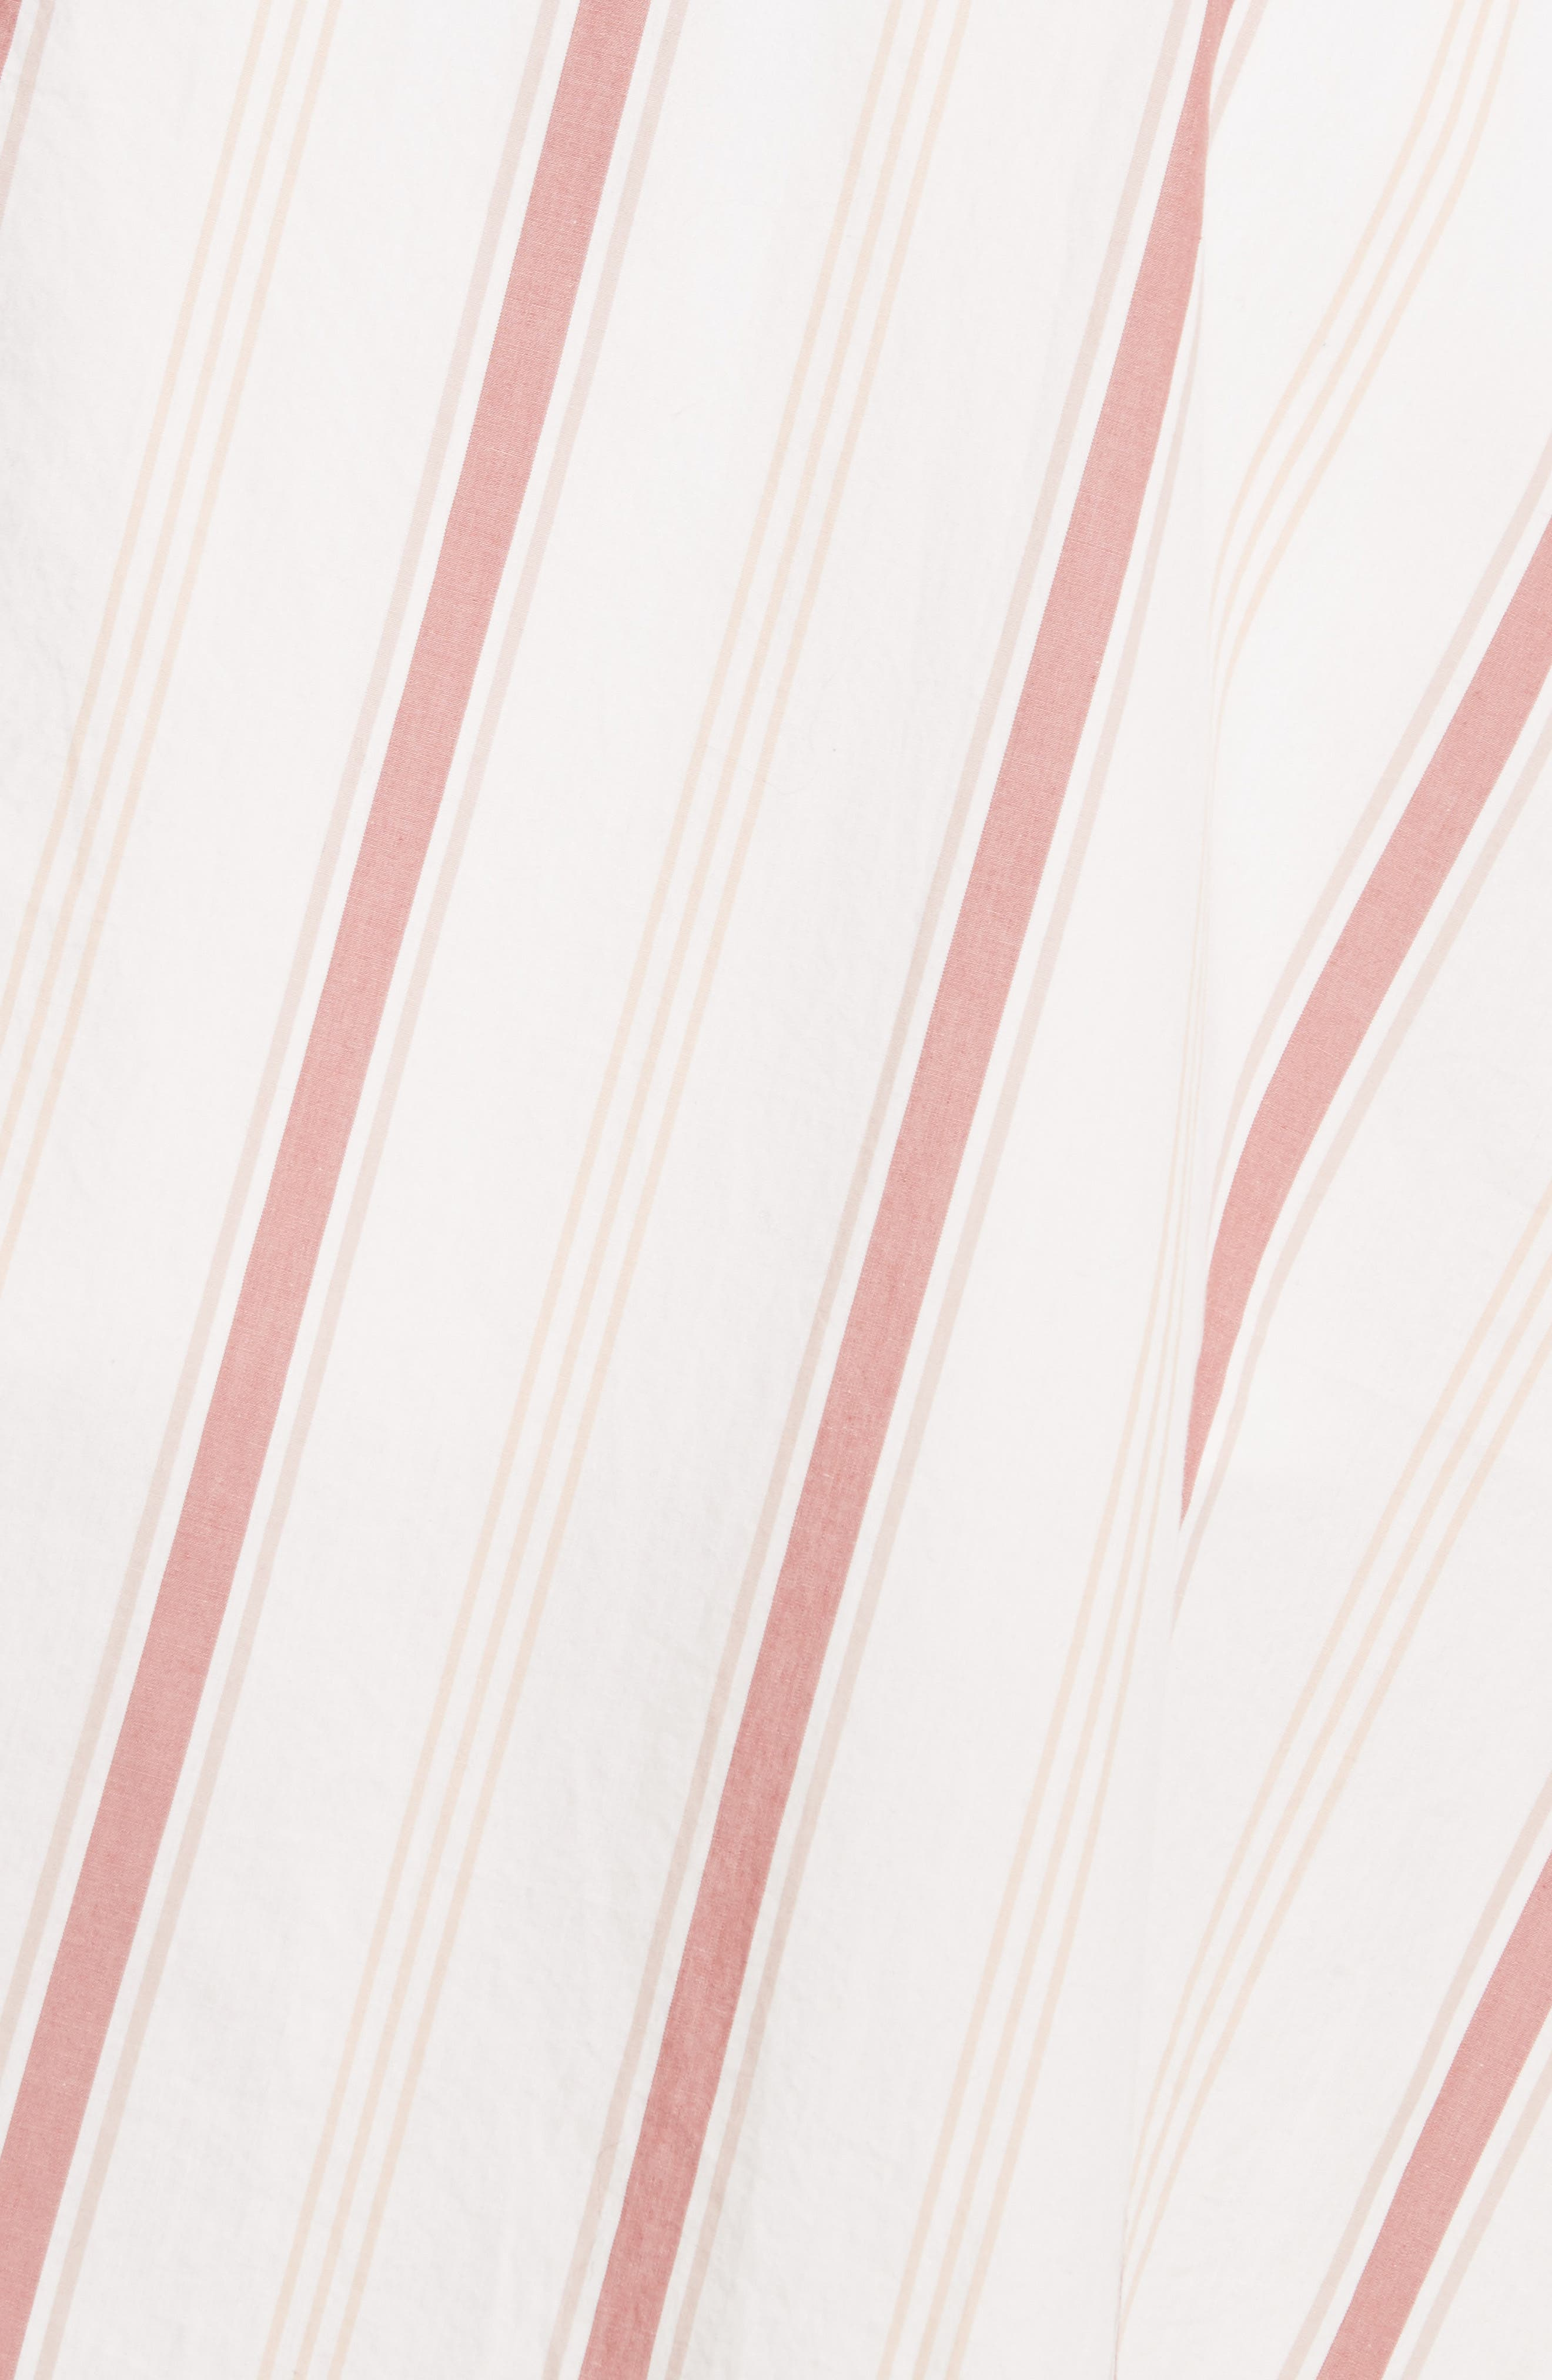 Hooked on Your Love Midi Skirt,                             Alternate thumbnail 5, color,                             903